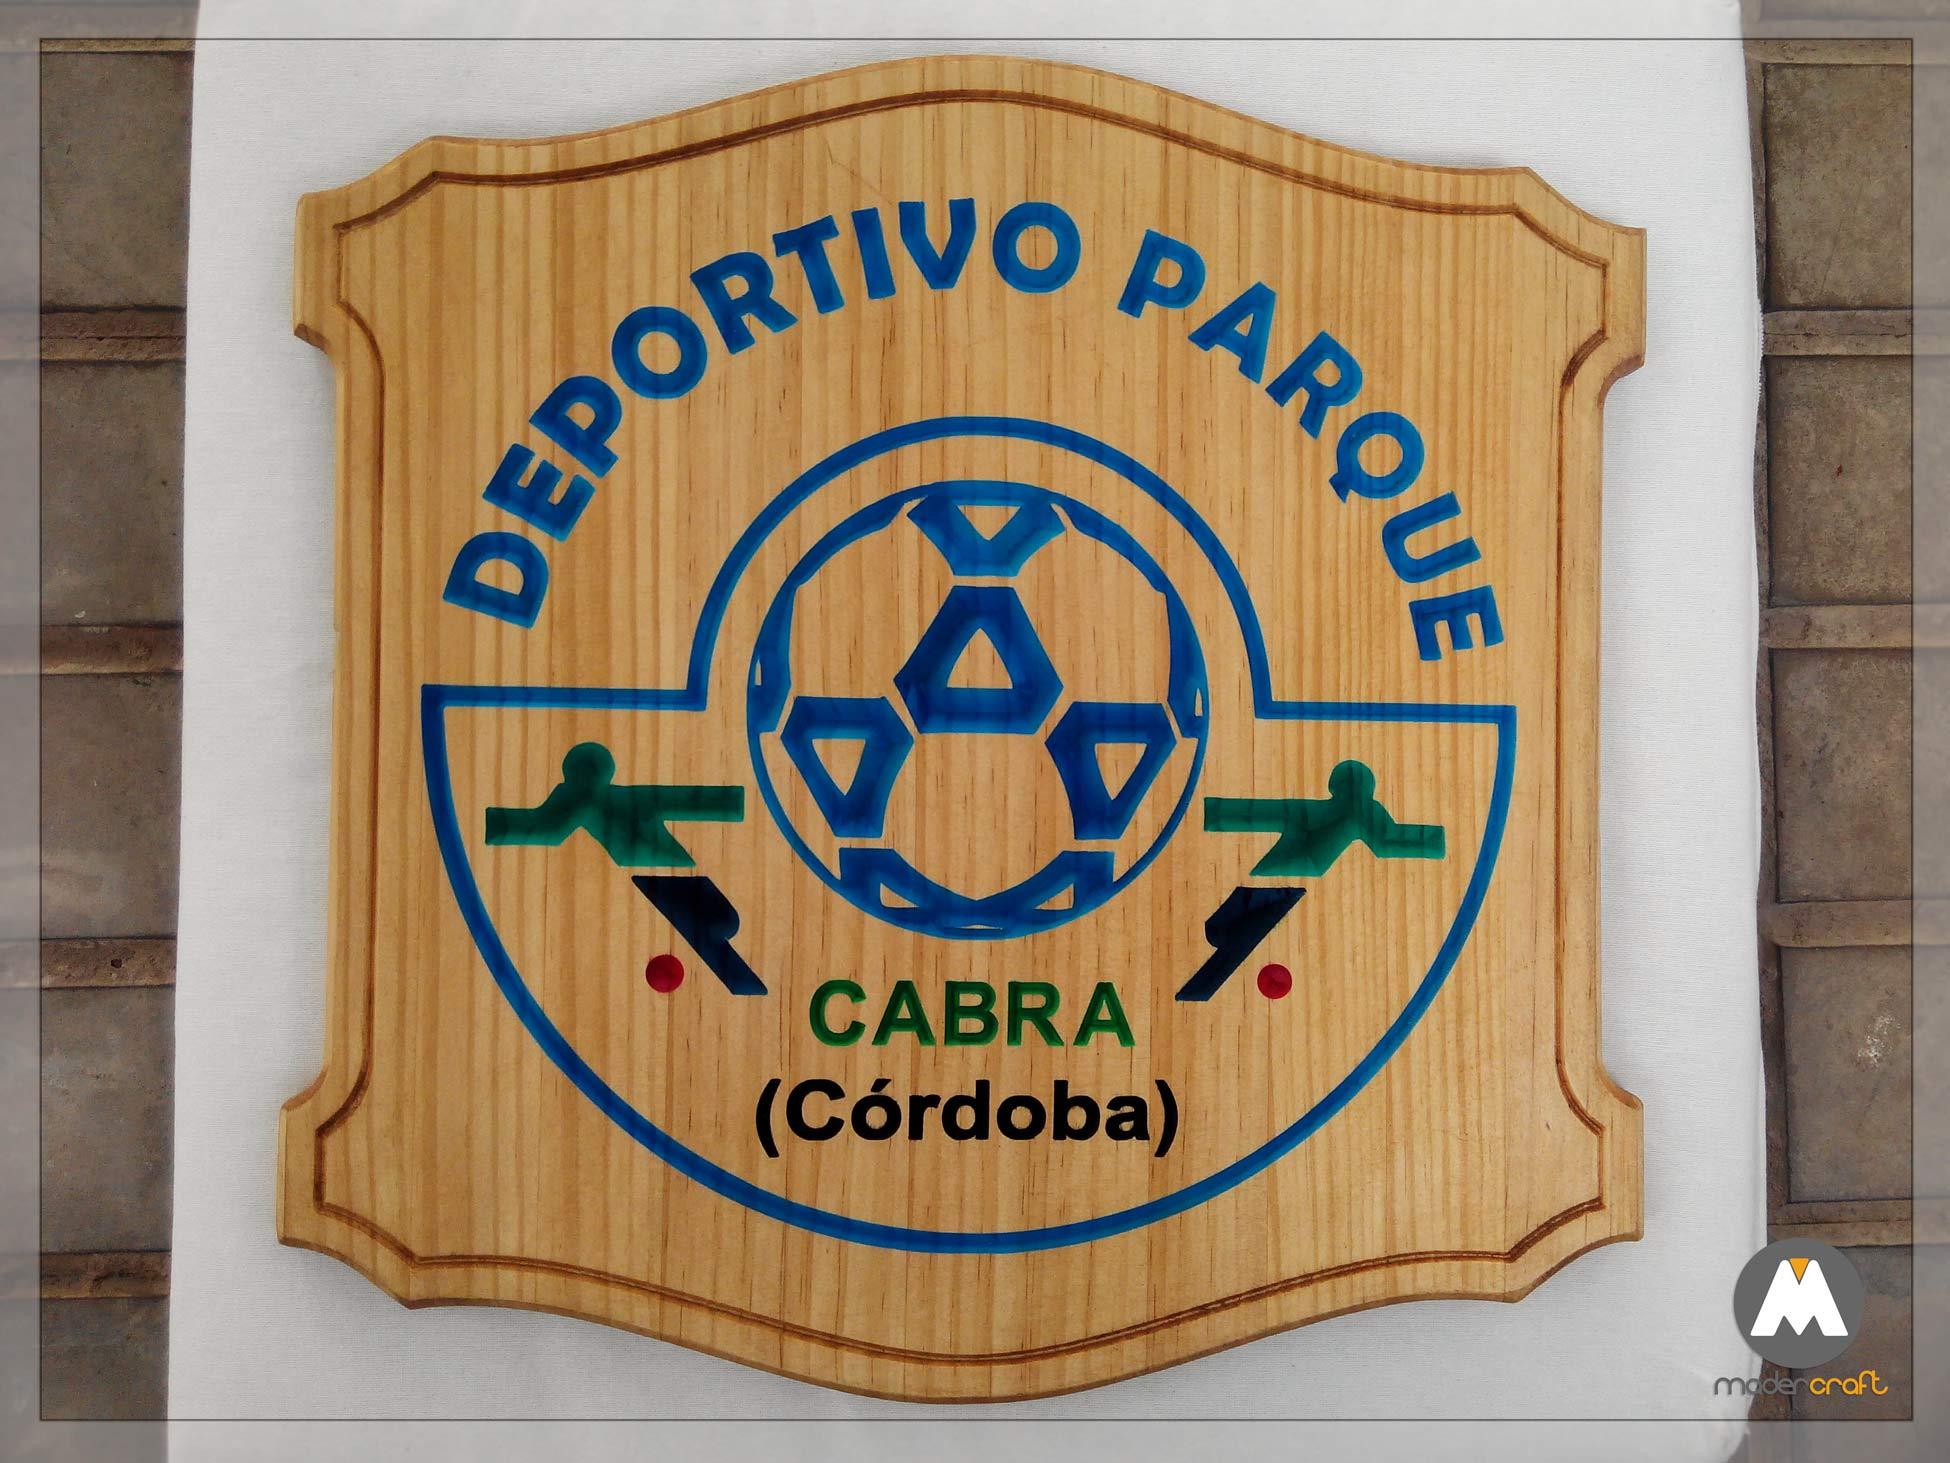 Placa Madera Deportiva Peña Cultural Egabrense. Cabra Córdoba Andalucía. Agradecimiento Homenaje Fútbol Balompié. Madera pino. placa para colgar. Balón escudo.